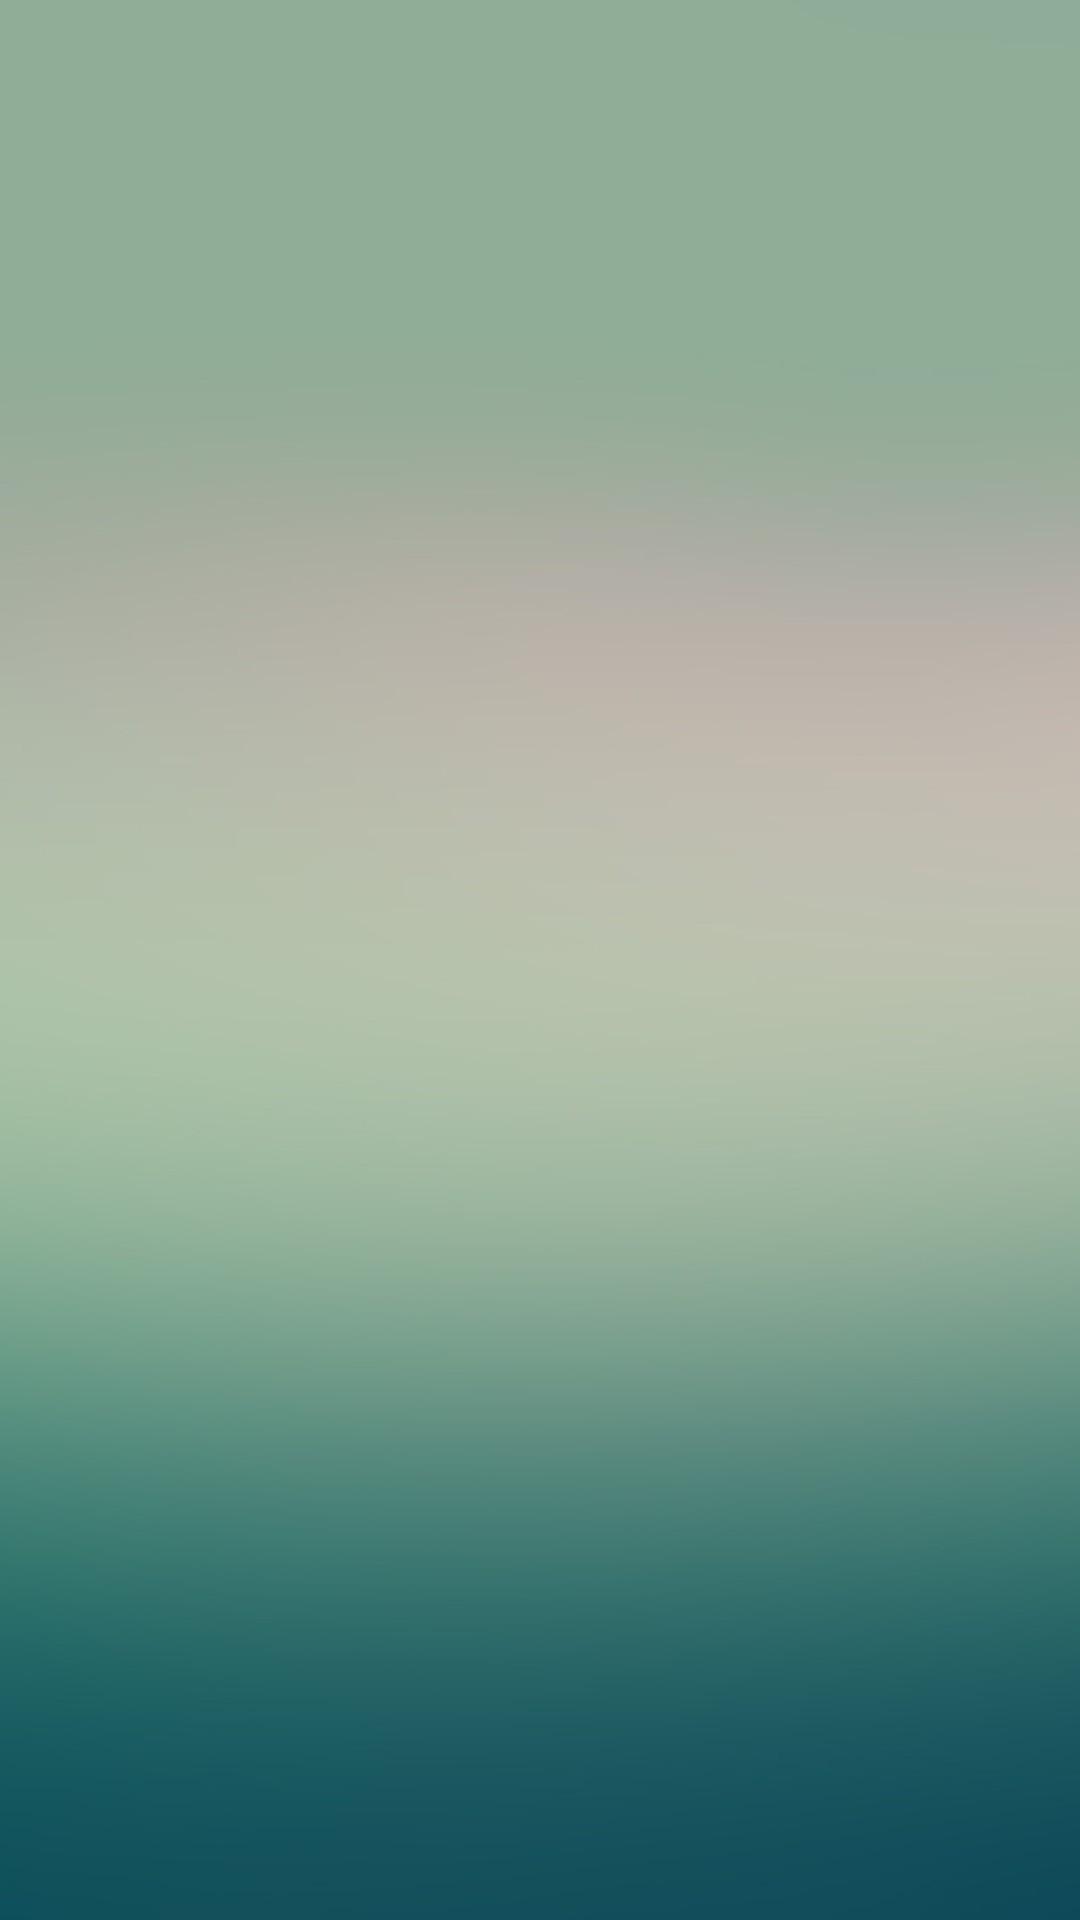 Mint Green iPhone Wallpapers - Wallpaper Cave